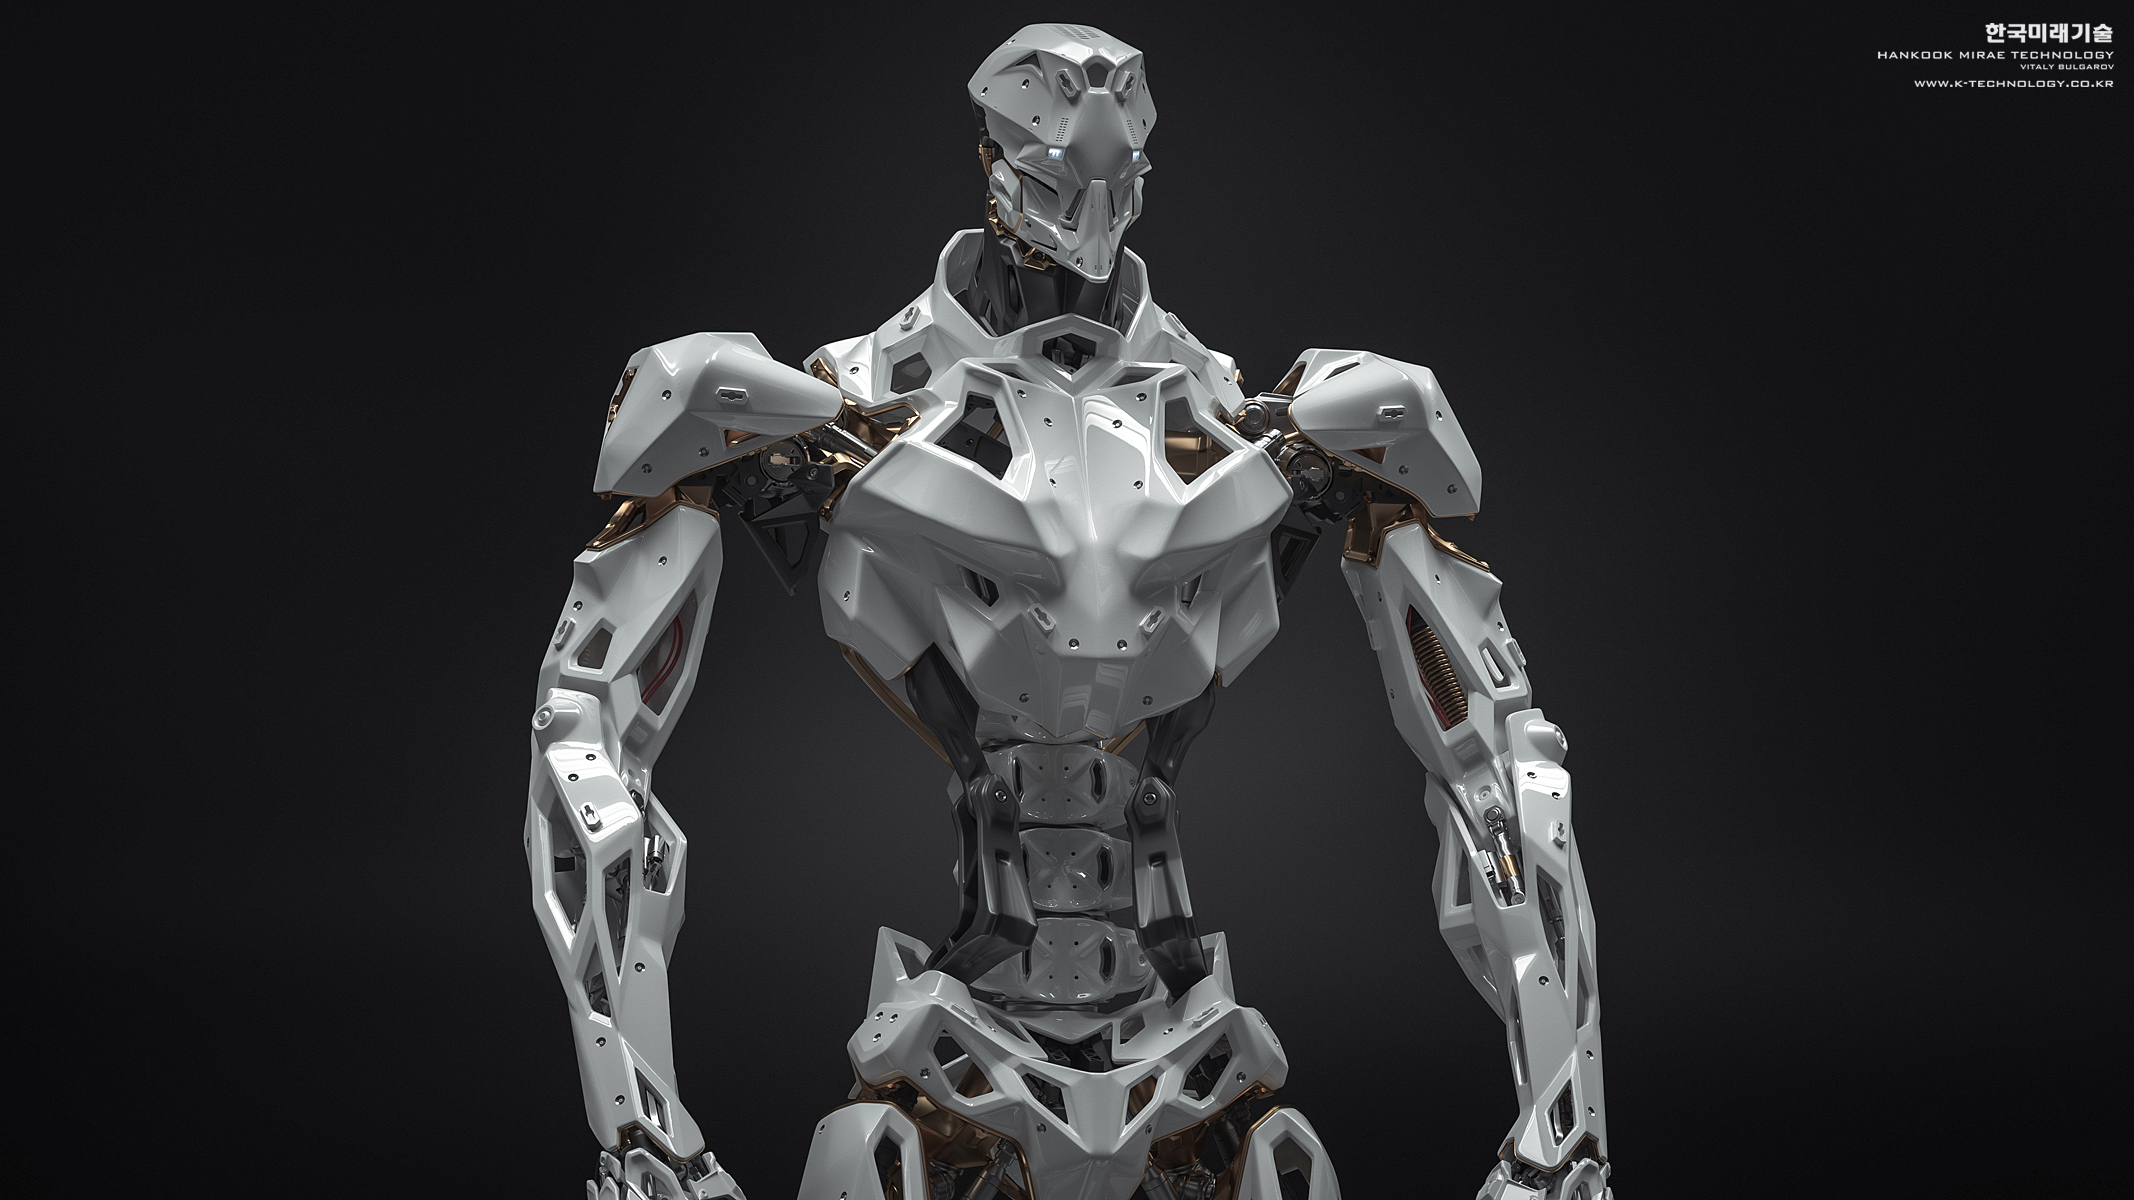 KFT_2.Xm_RobotDesign_ (10 of 29).jpg